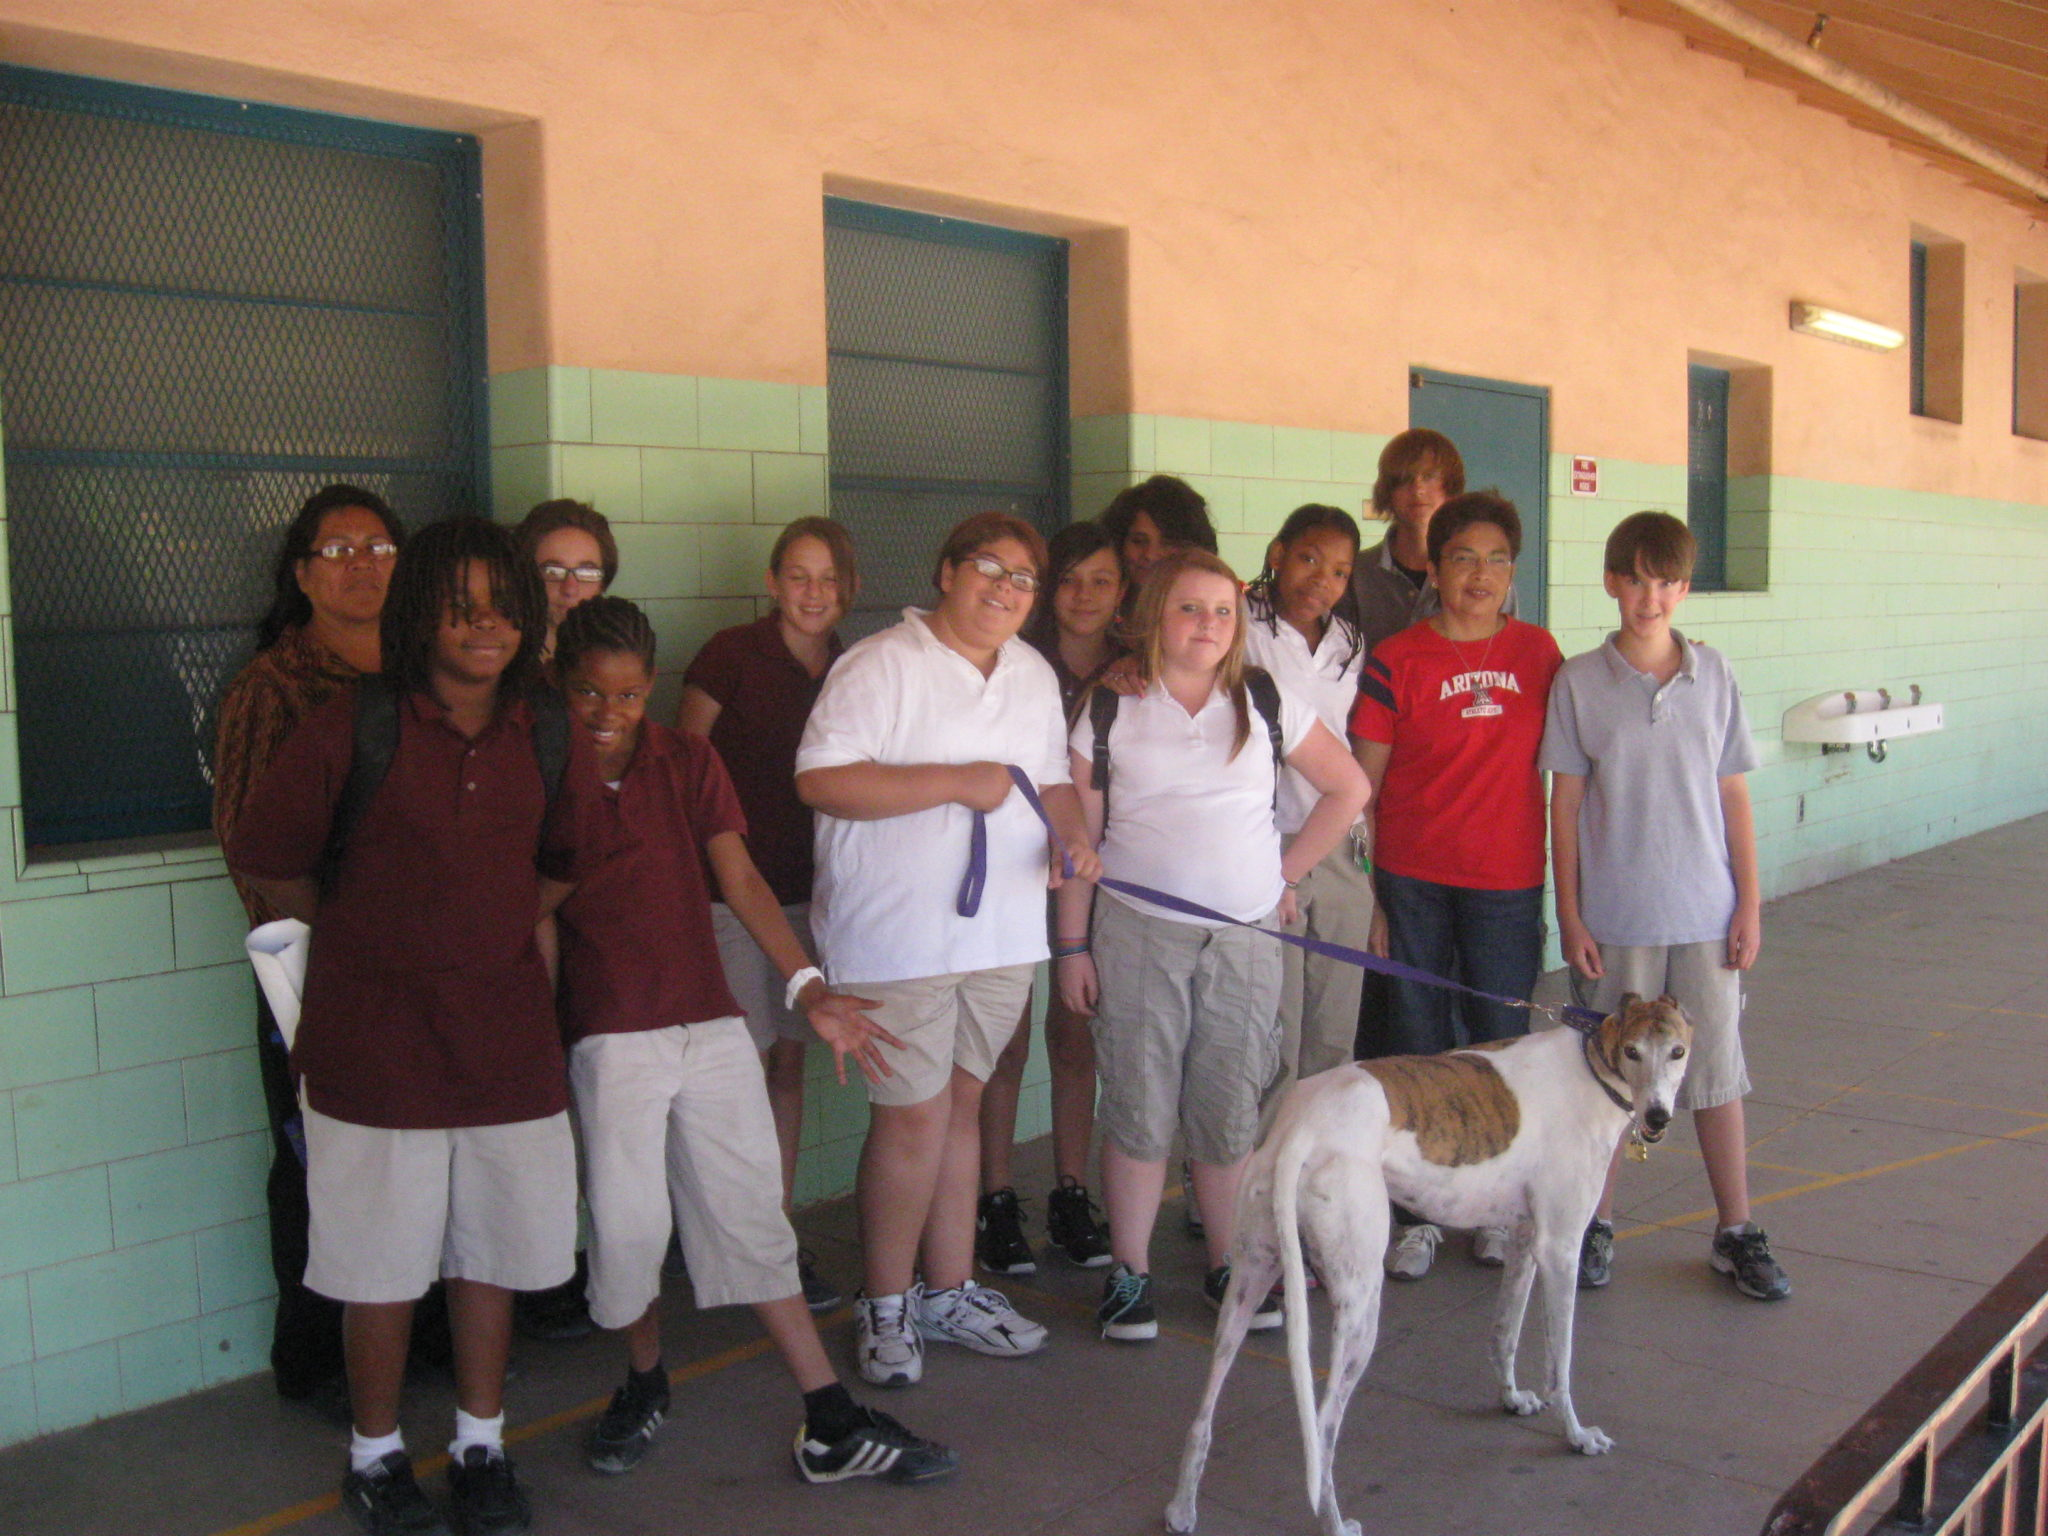 Tucson greyhound Jett visits school